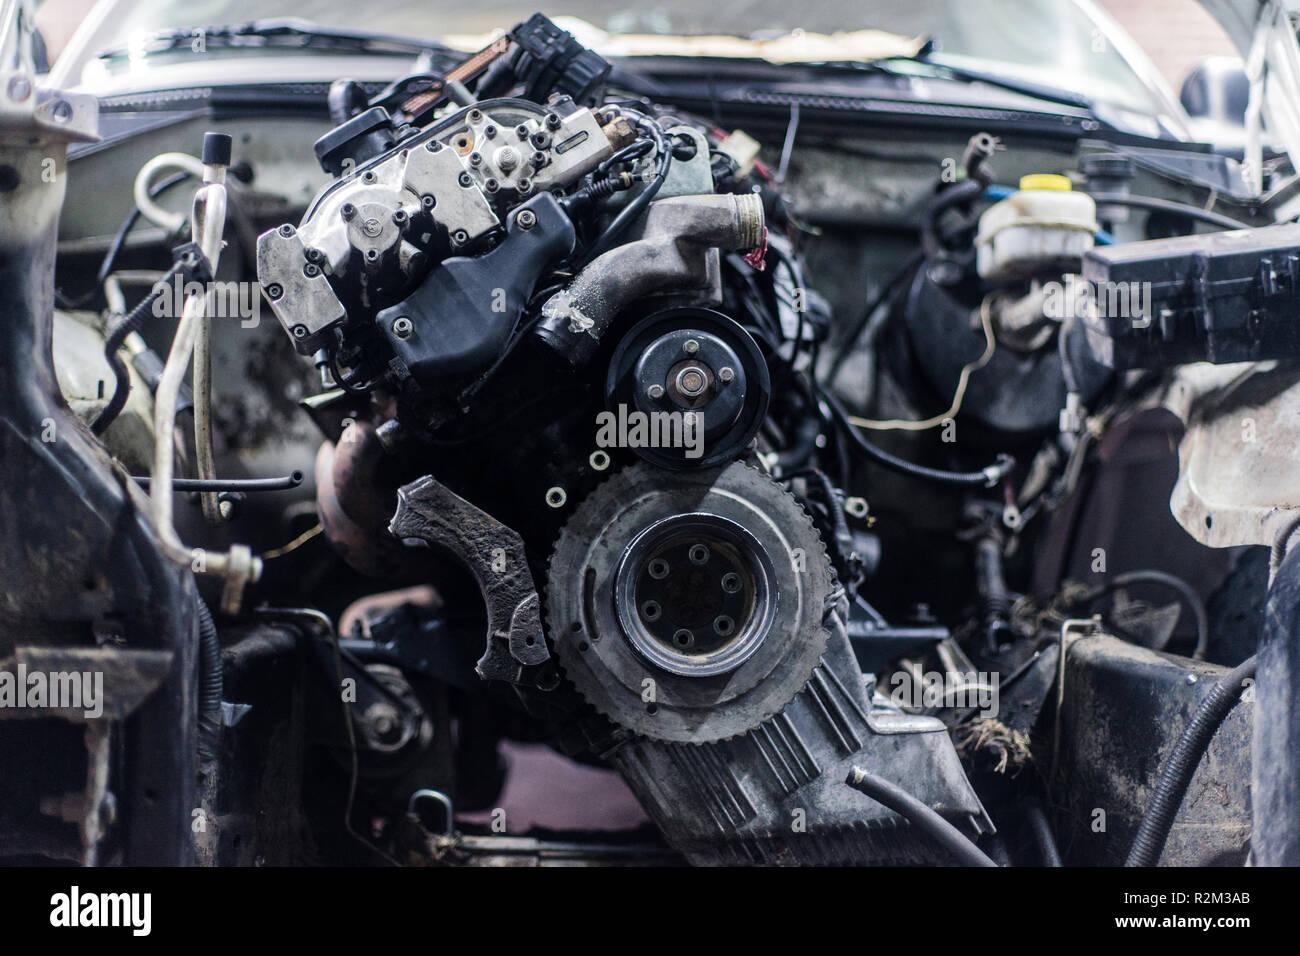 Legendary Car Engines